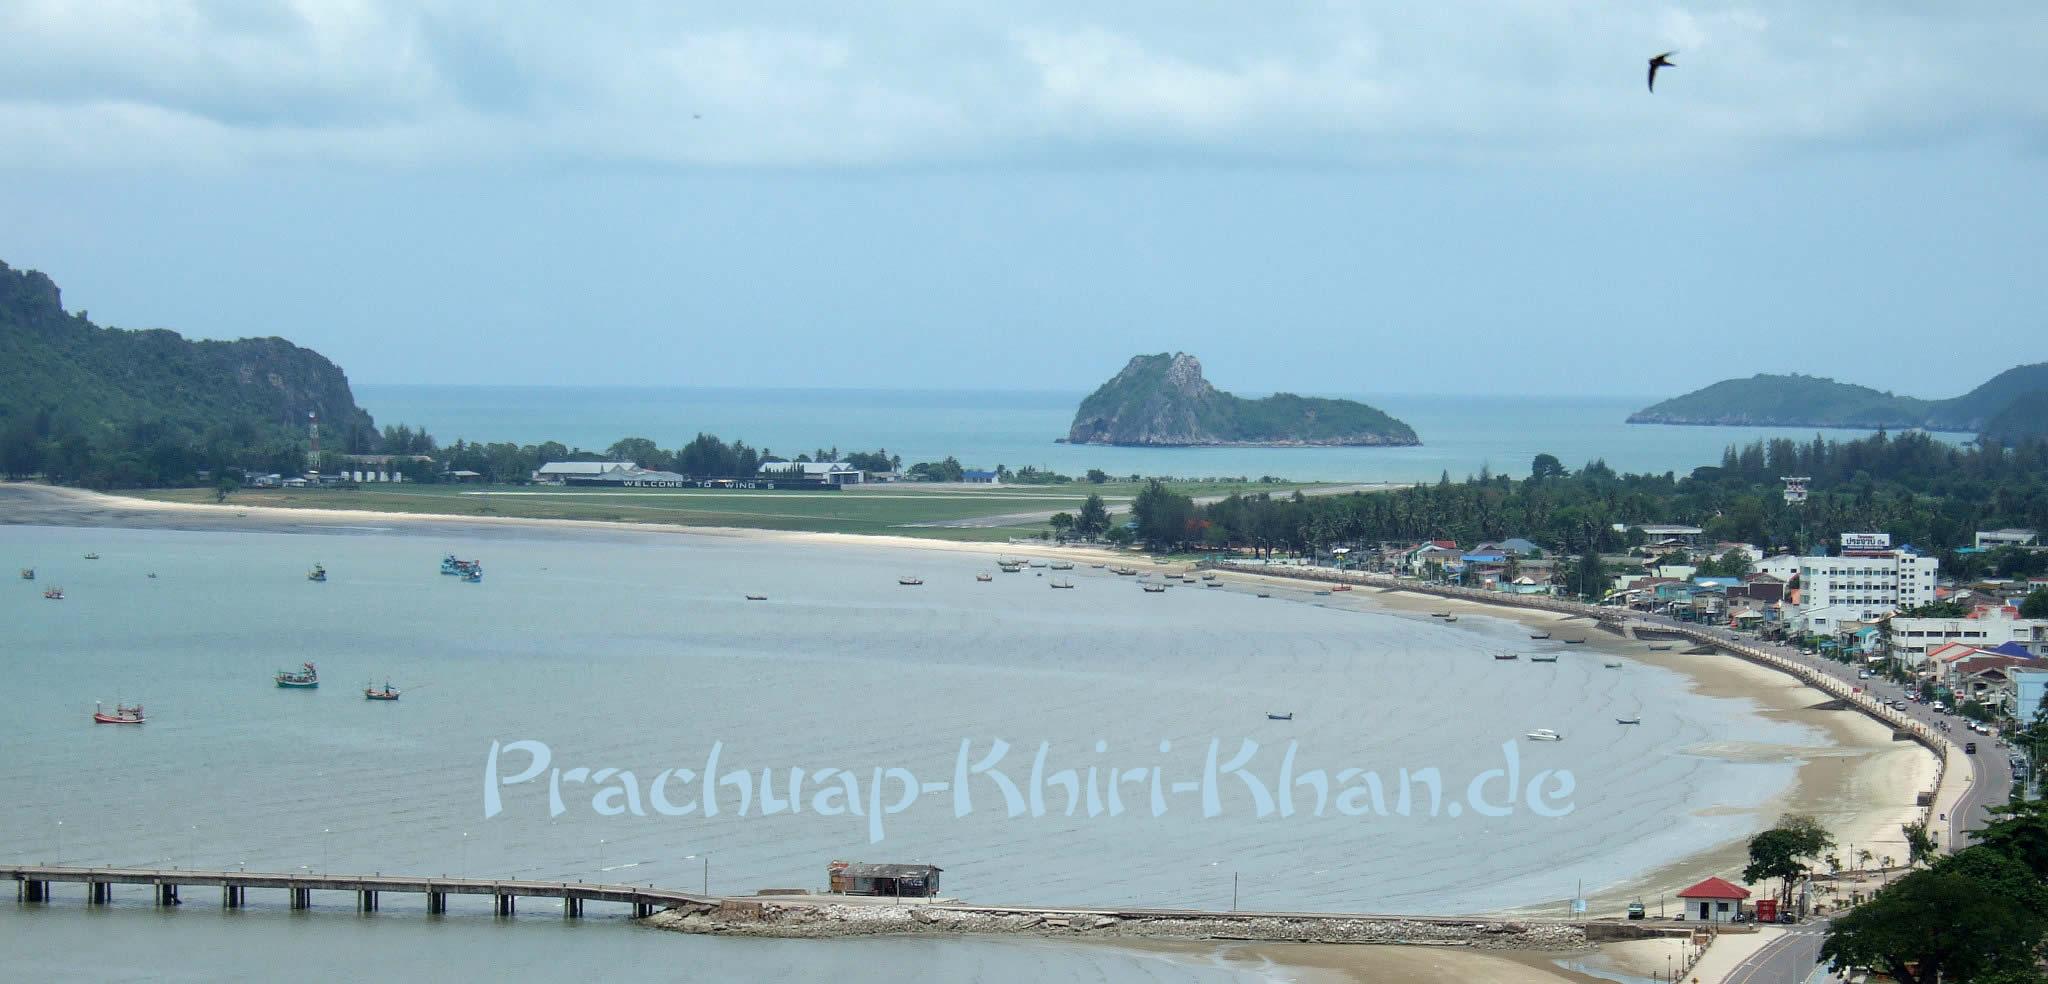 Prachuap Khiri Khan Thailand  city images : ... von Prachuap Khiri Khan und von anderen schönen Städten in Thailand